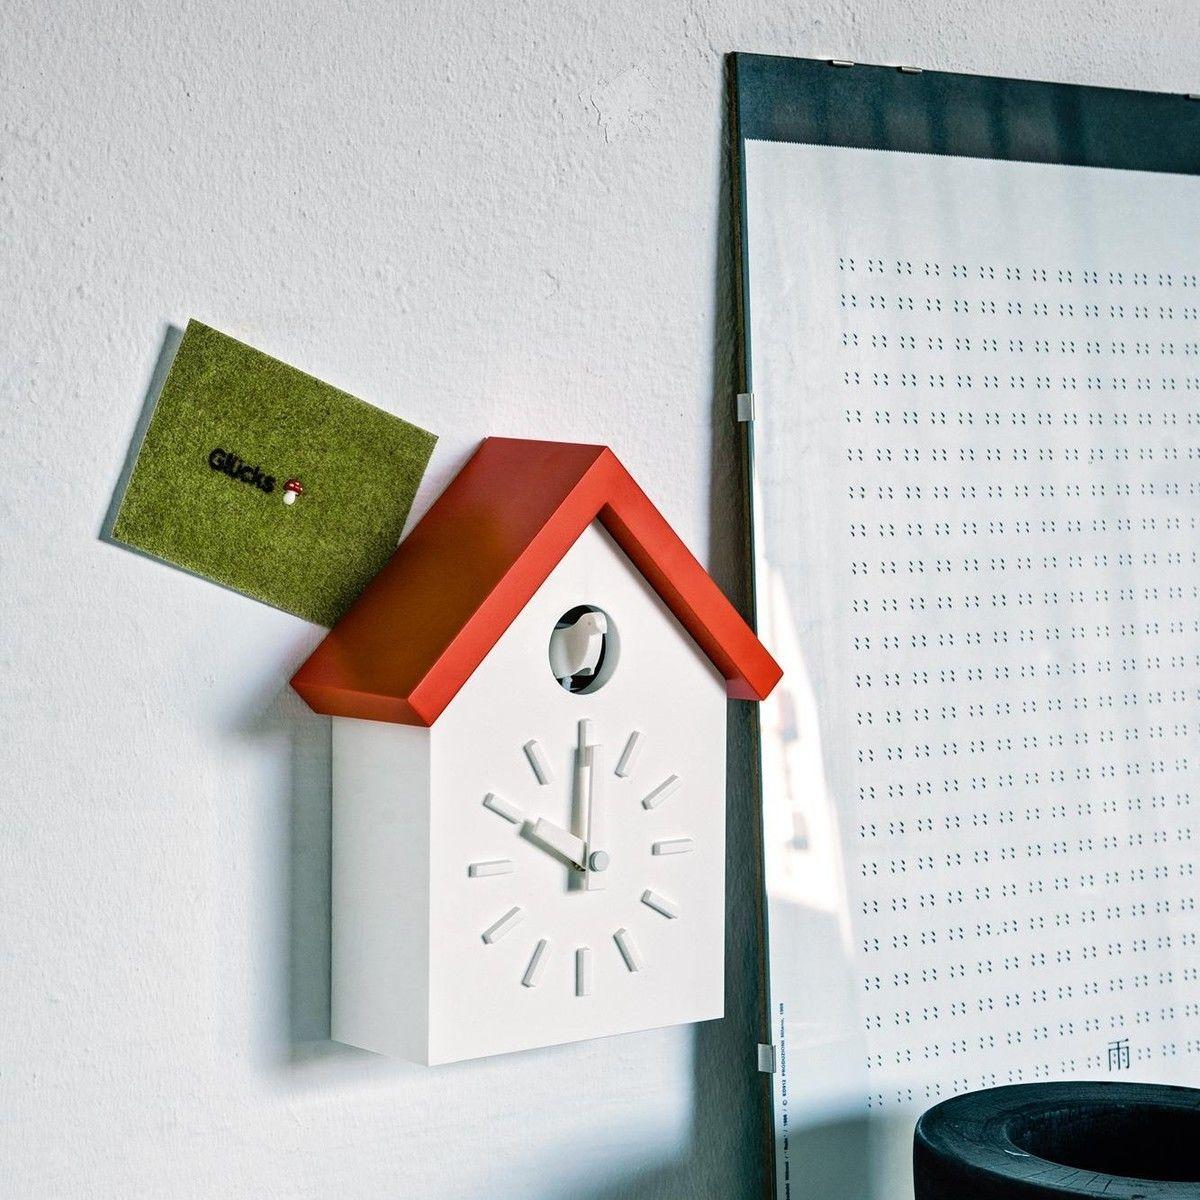 cu clock coucou horloge murale magis. Black Bedroom Furniture Sets. Home Design Ideas